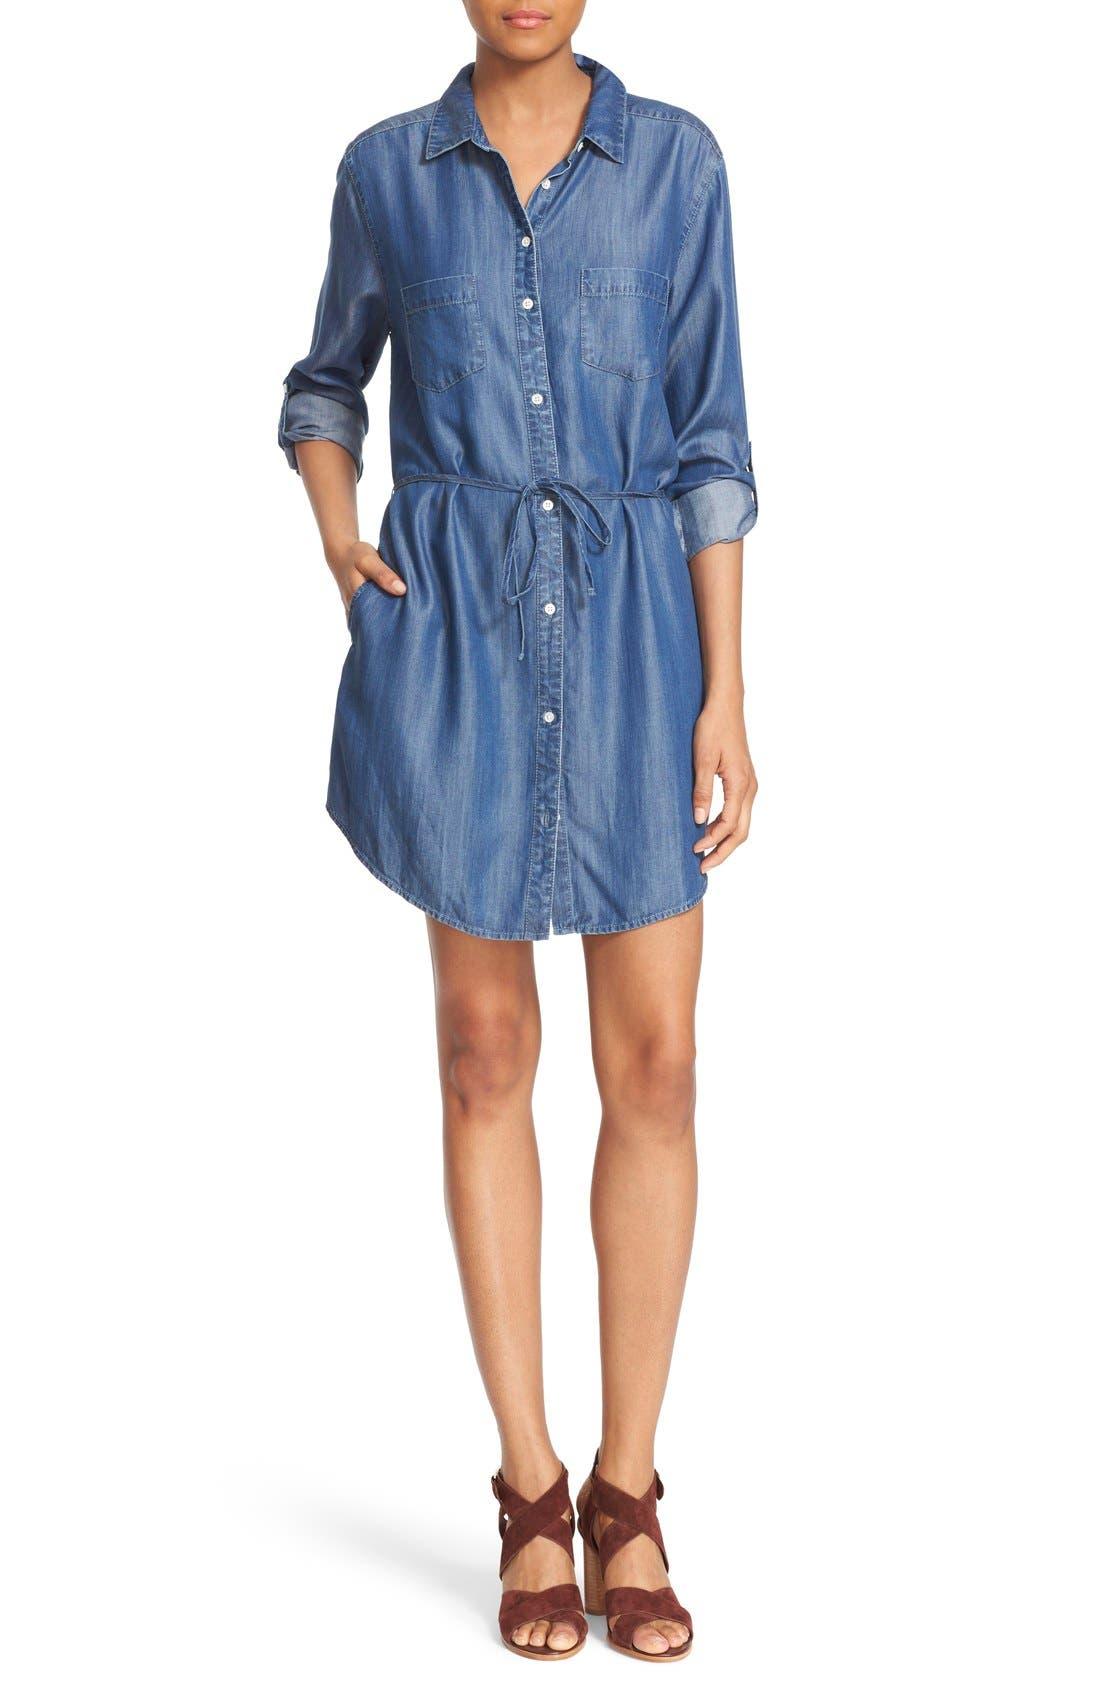 Alternate Image 1 Selected - Soft Joie 'Lilyana' Roll Sleeve Shirtdress